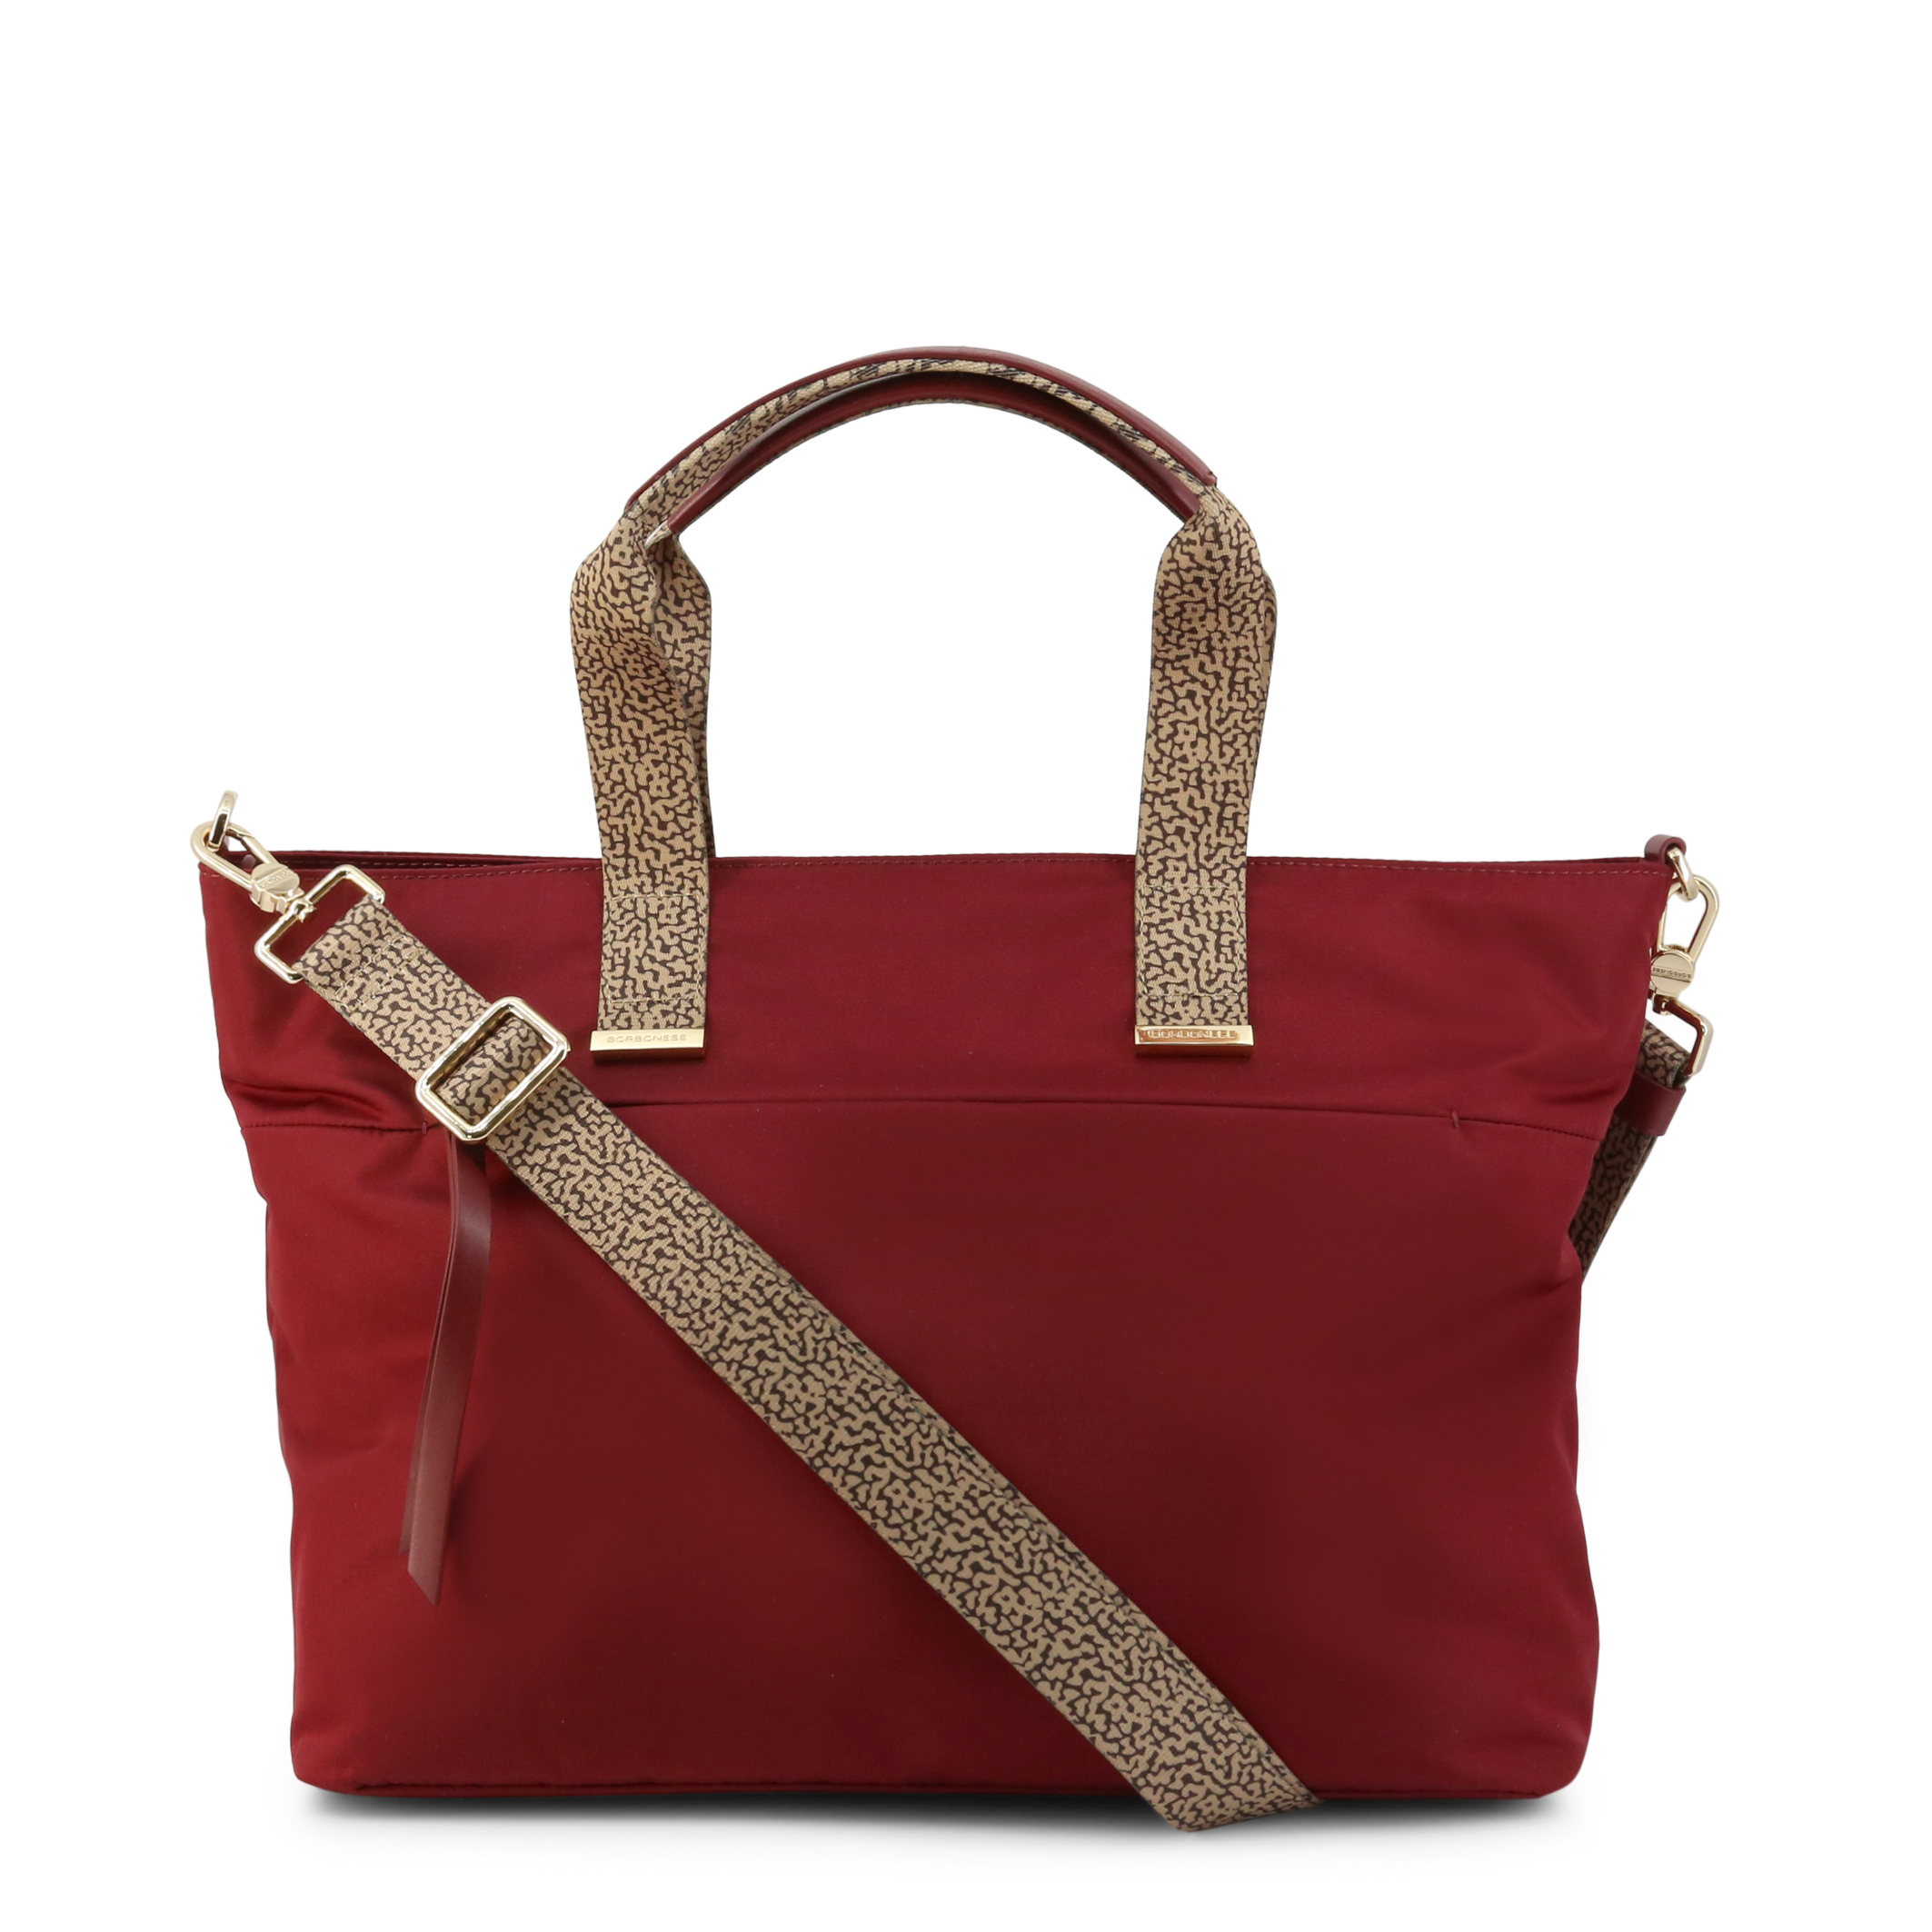 Borbonese - 924083-138 - Red